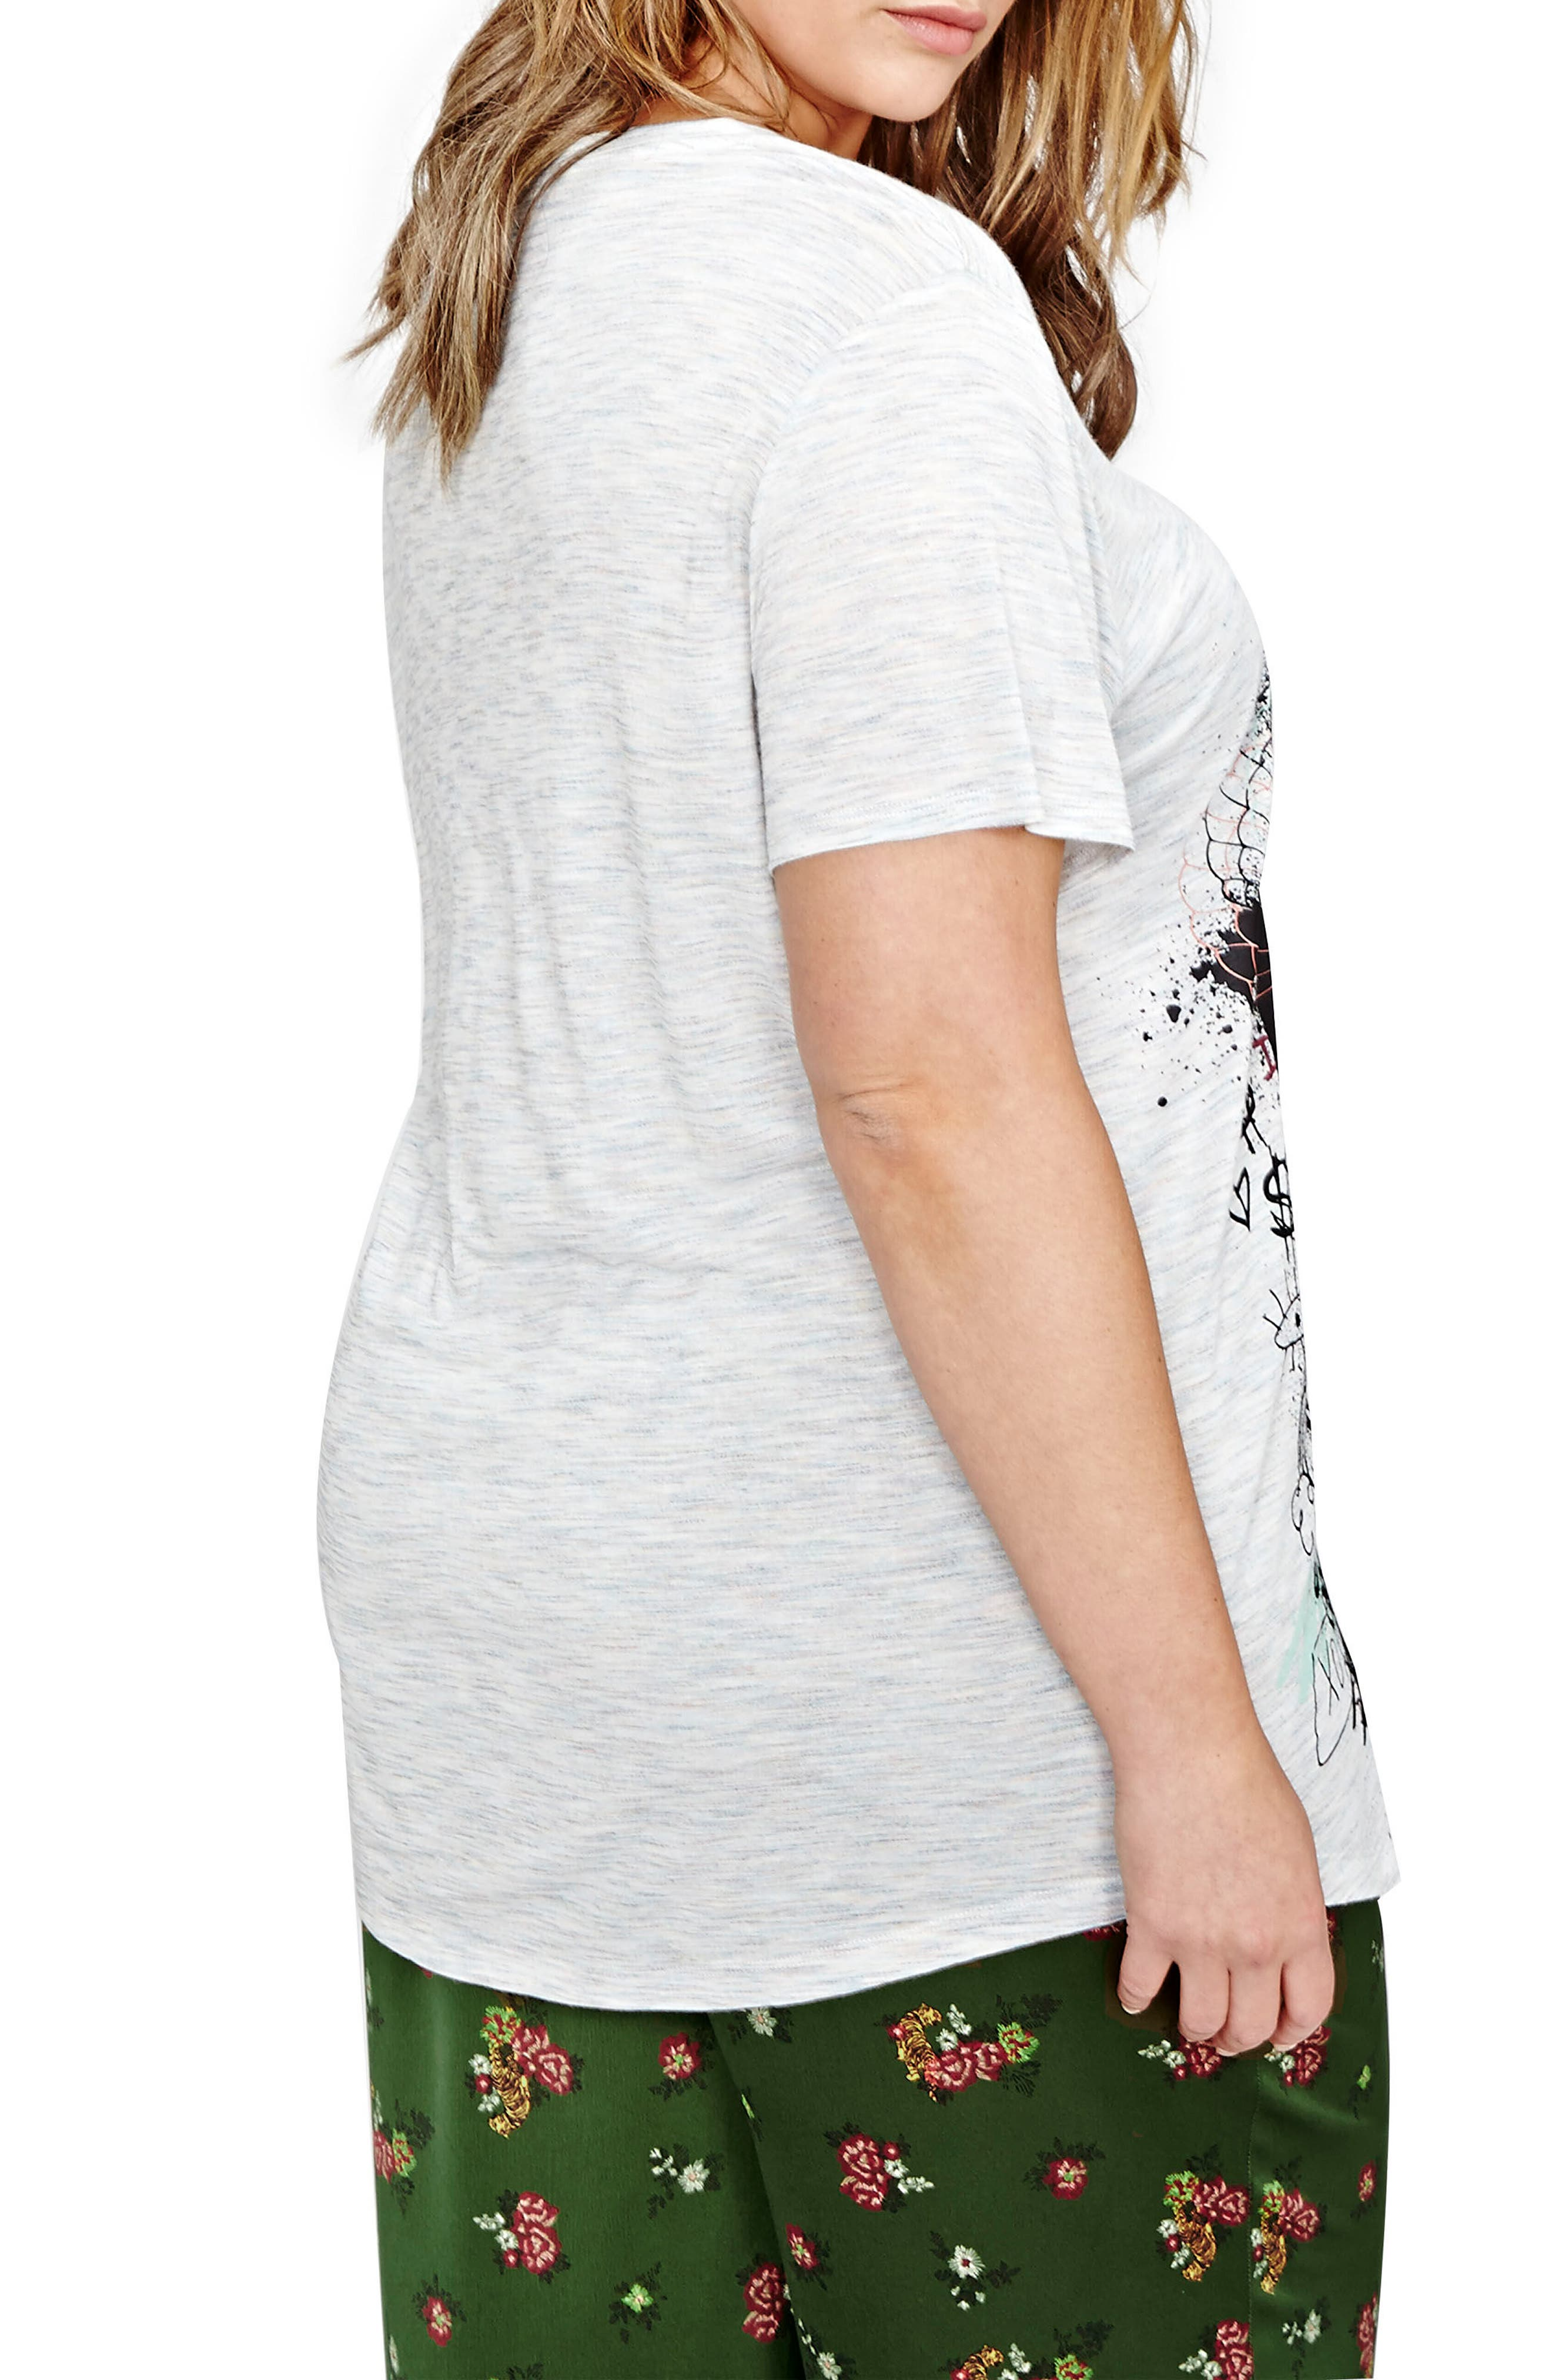 Alternate Image 3  - ADDITION ELLE LOVE AND LEGEND Jordyn Woods Graphic Boyfriend Tee (Plus Size)